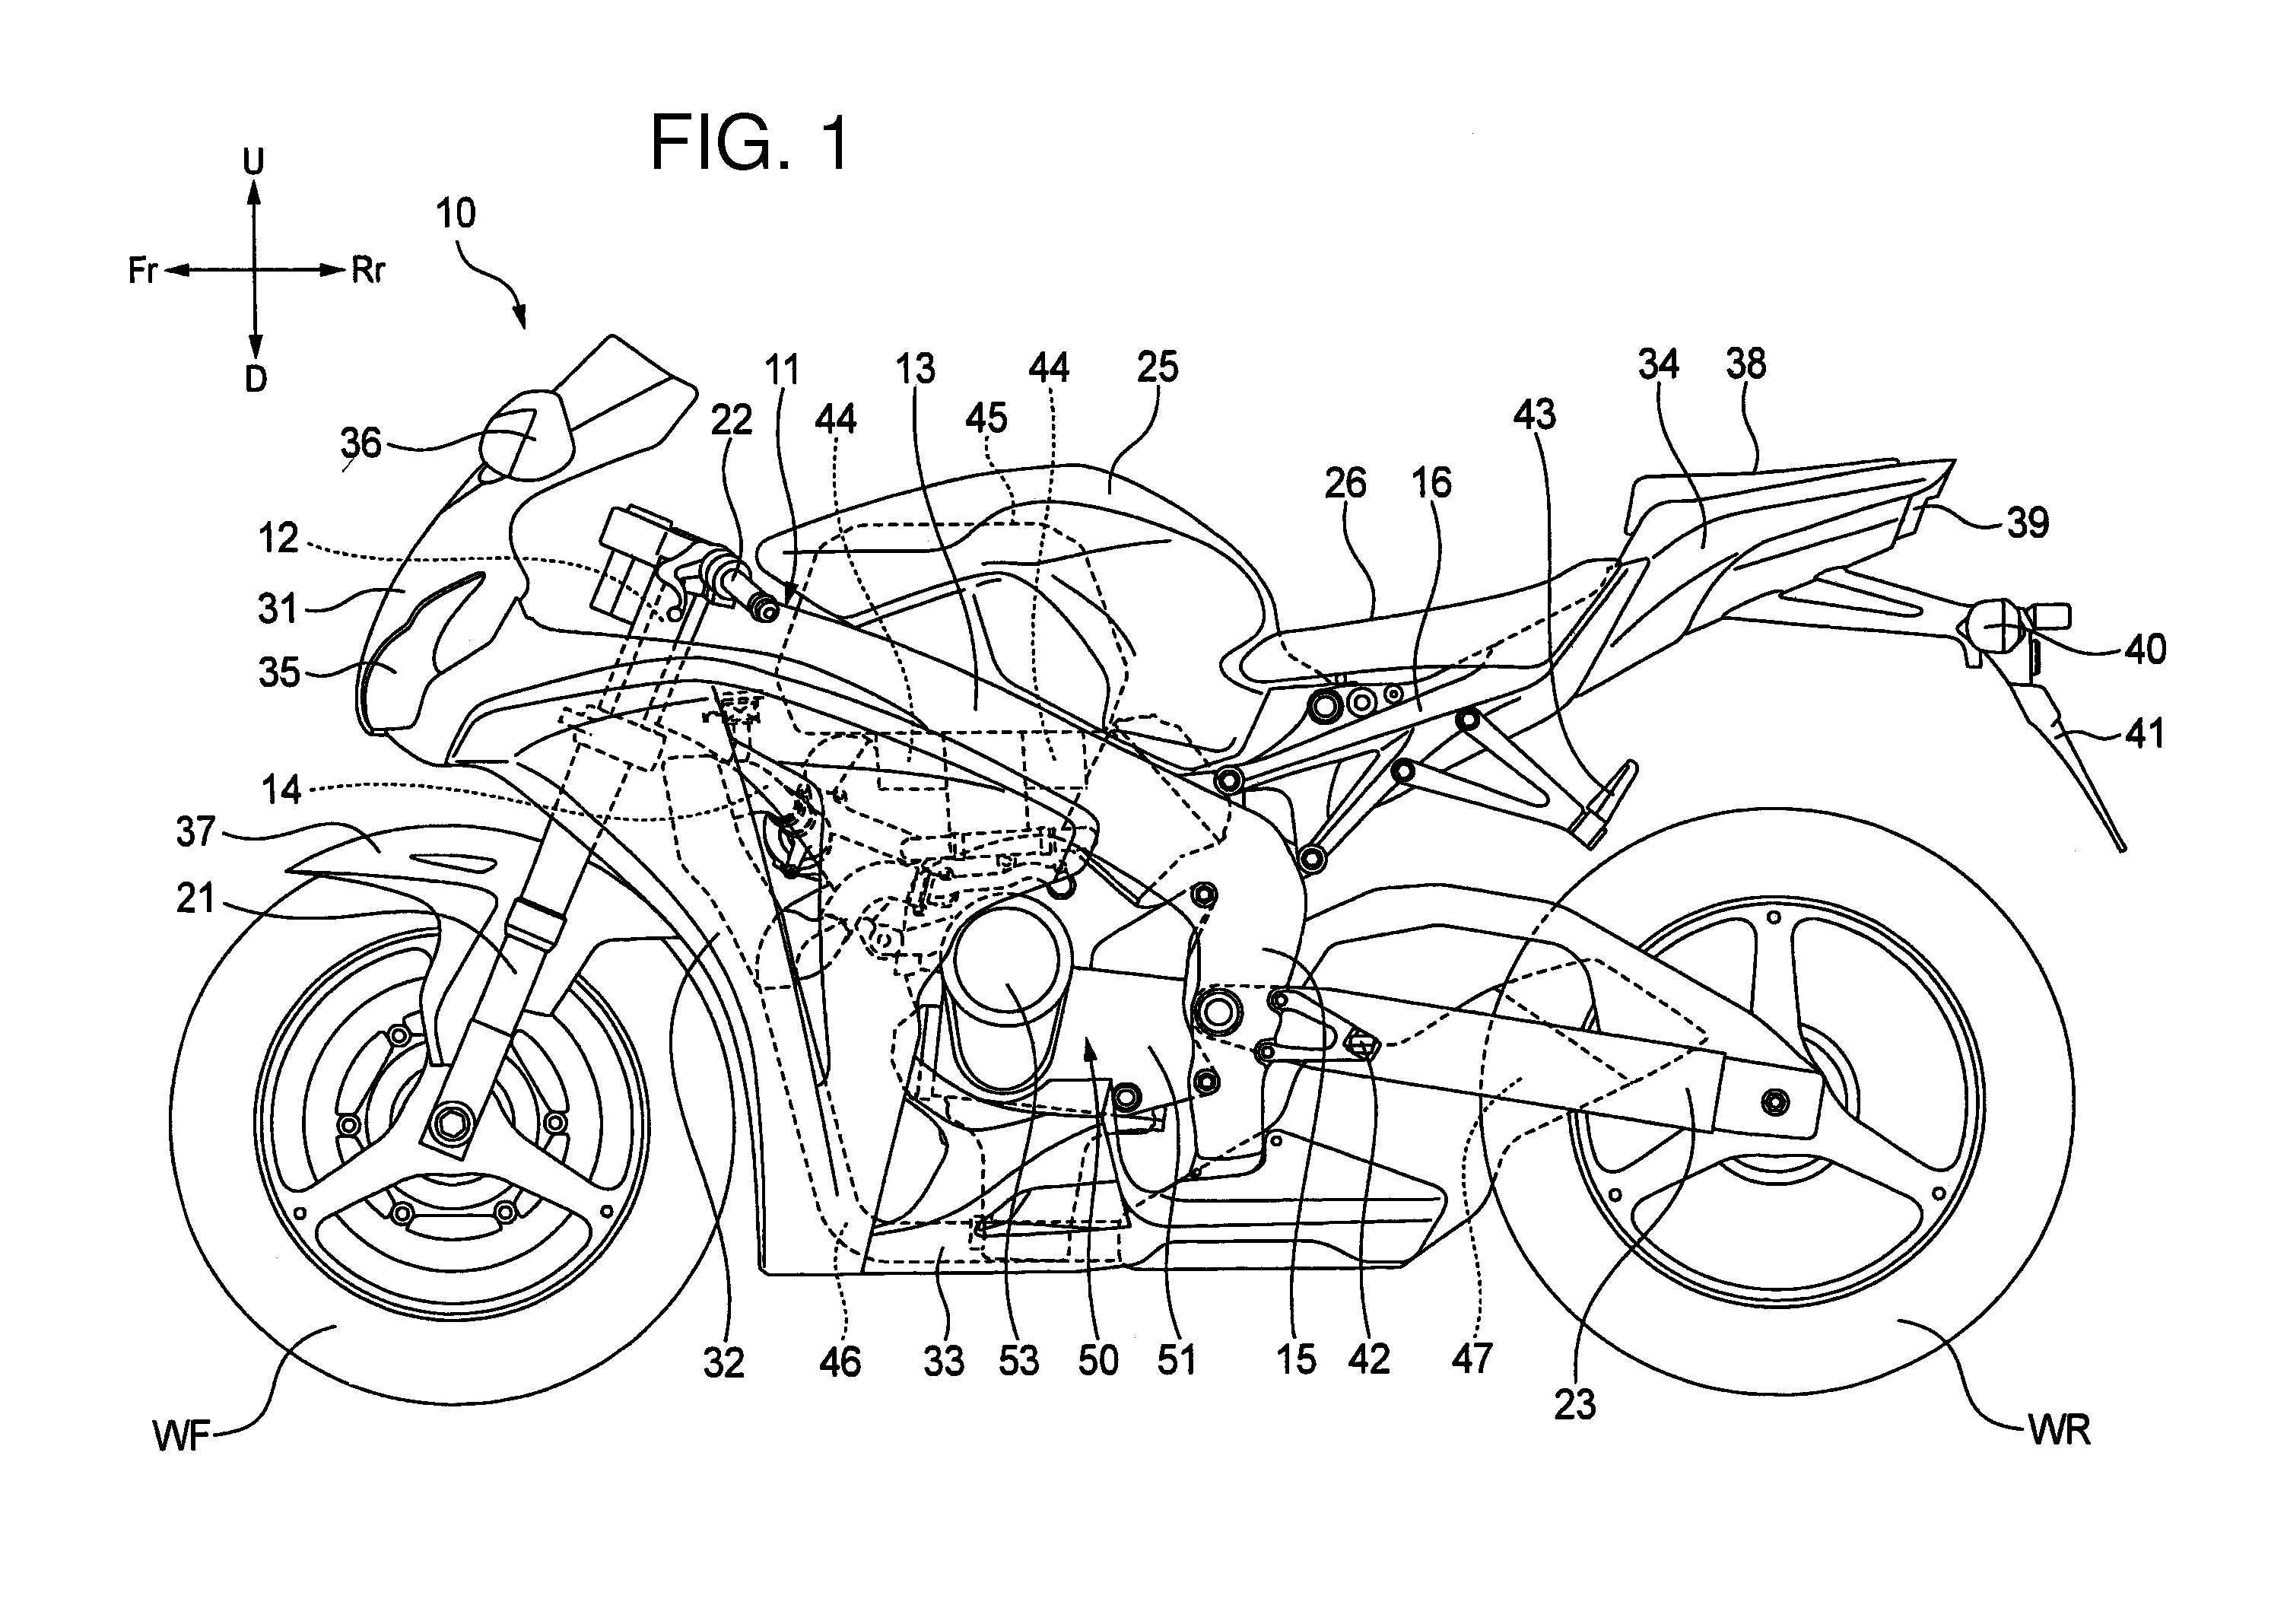 Interesting Honda Patent Drawings Honda Rc51 Forum Rc51 Motorcycle Forums Patent Patents Patentdrawings Drawing I Patent Drawing Honda Fireblade Honda